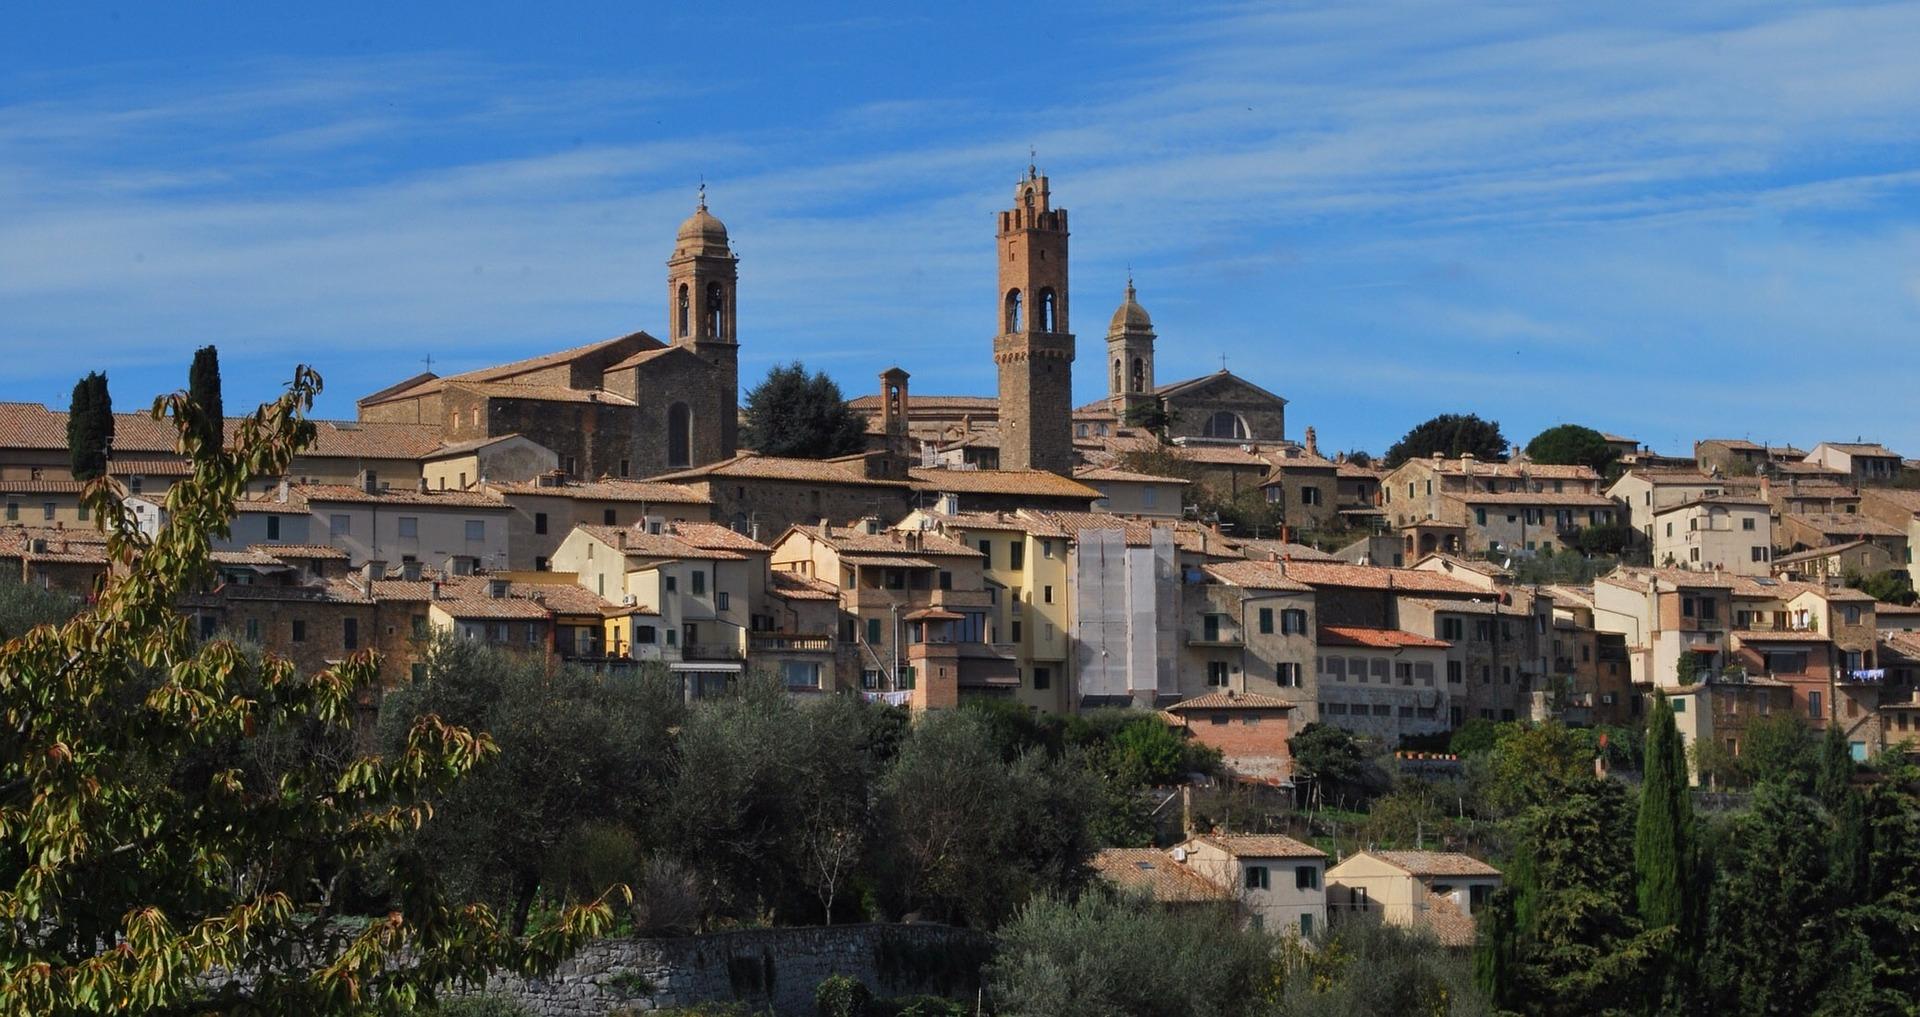 Montalcino photo by pixabay RossanoValeri